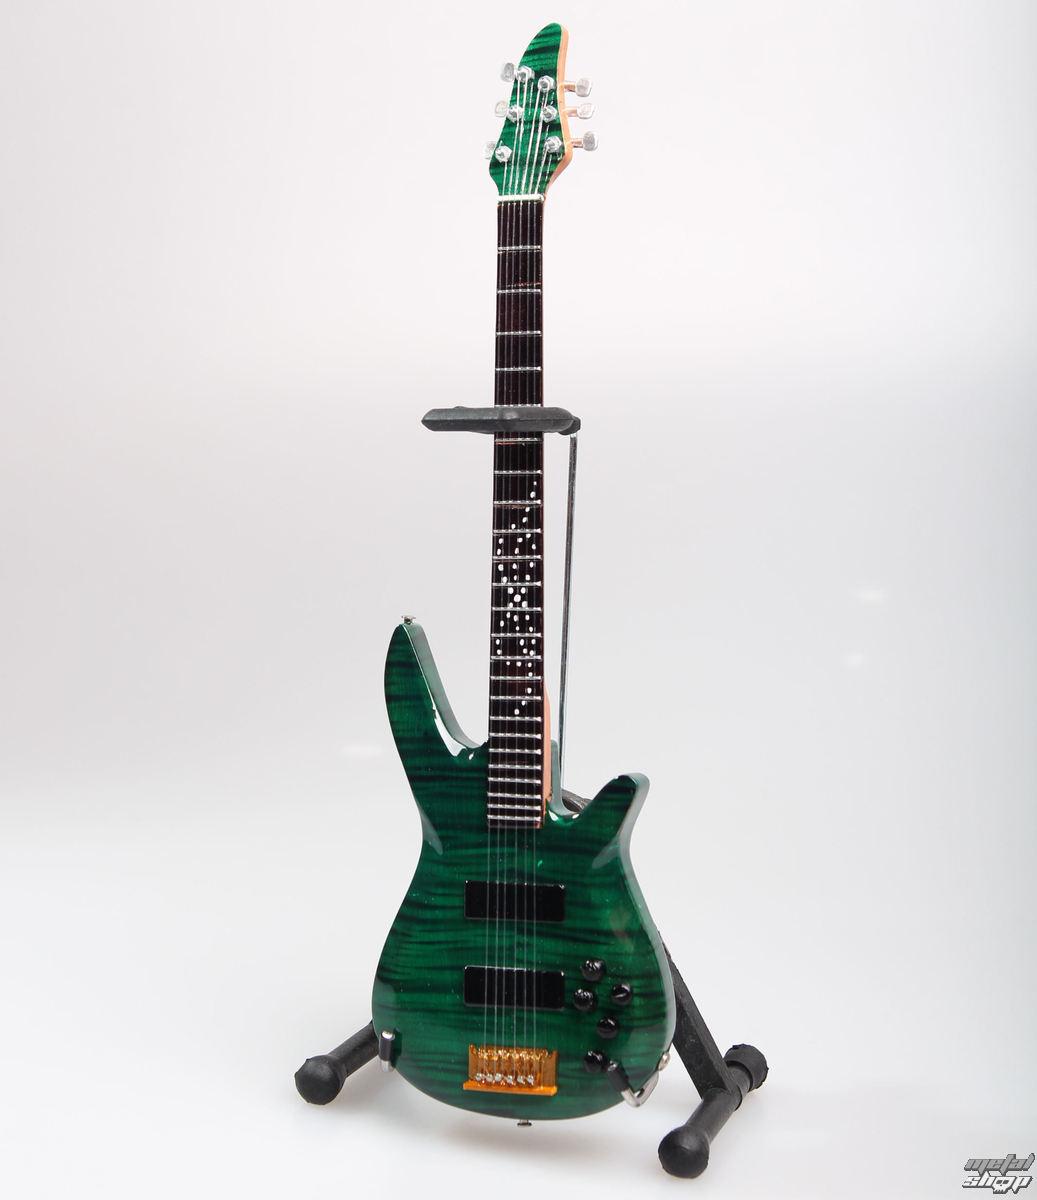 gitara Dream Theater - John Myung - Turquoise - MINI GUITAR USA - JMY Green